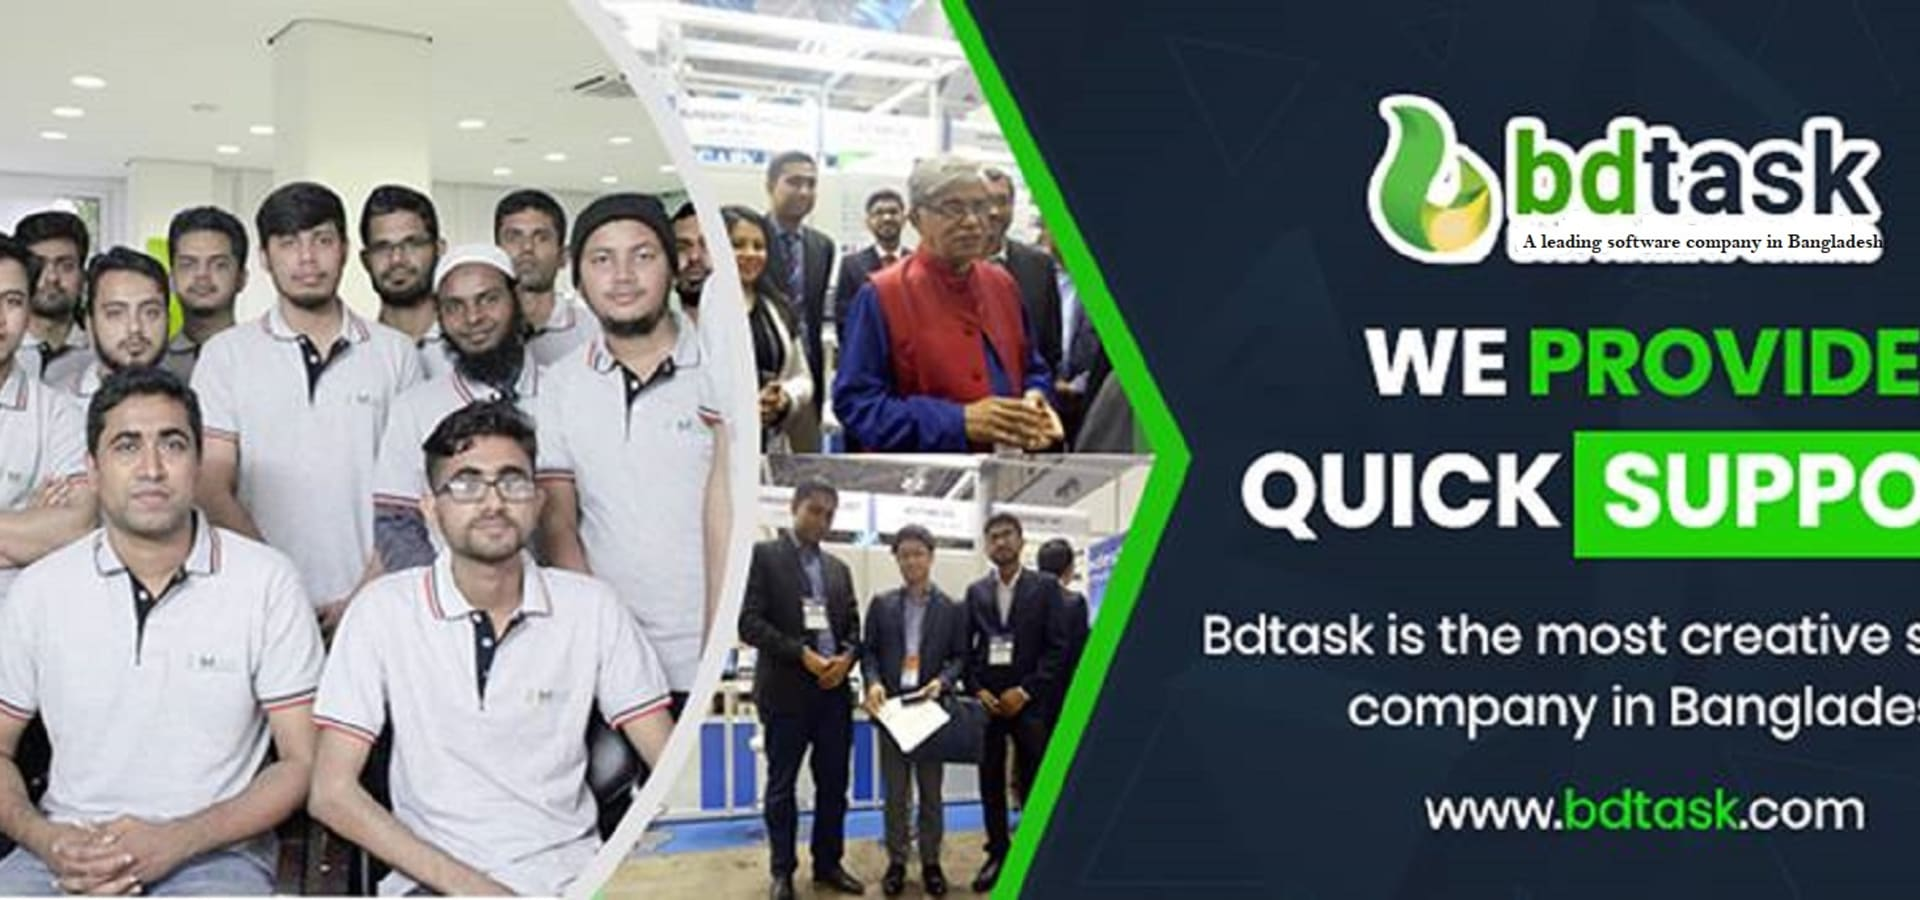 BDtask Ltd